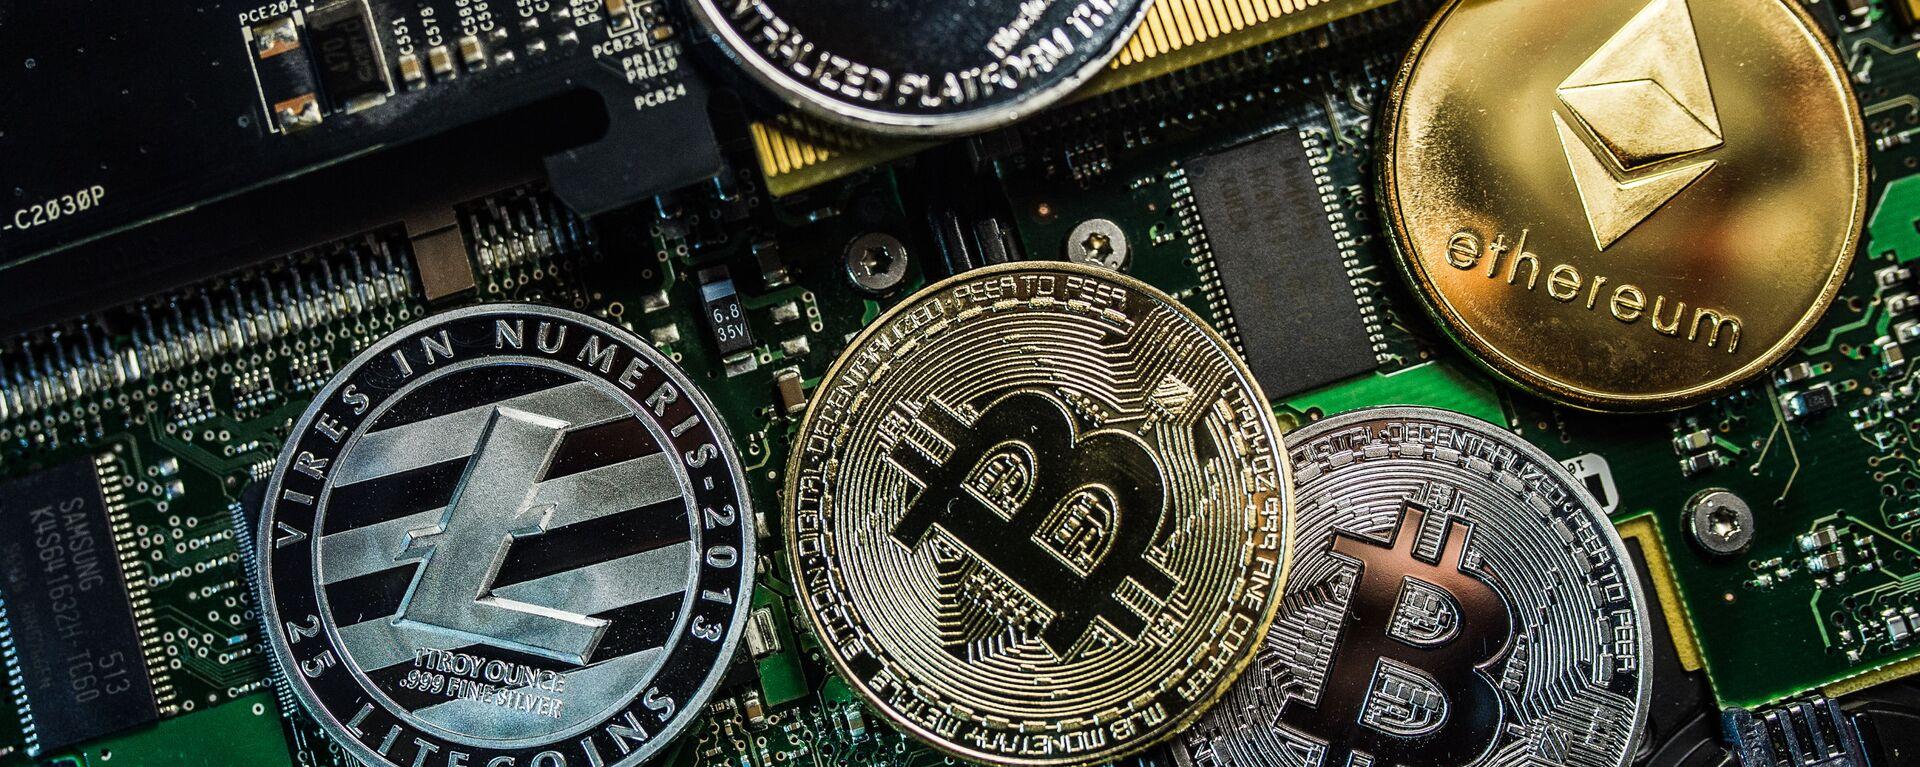 Bitcoin, Litecoin и Ethereum - Sputnik Việt Nam, 1920, 16.02.2021